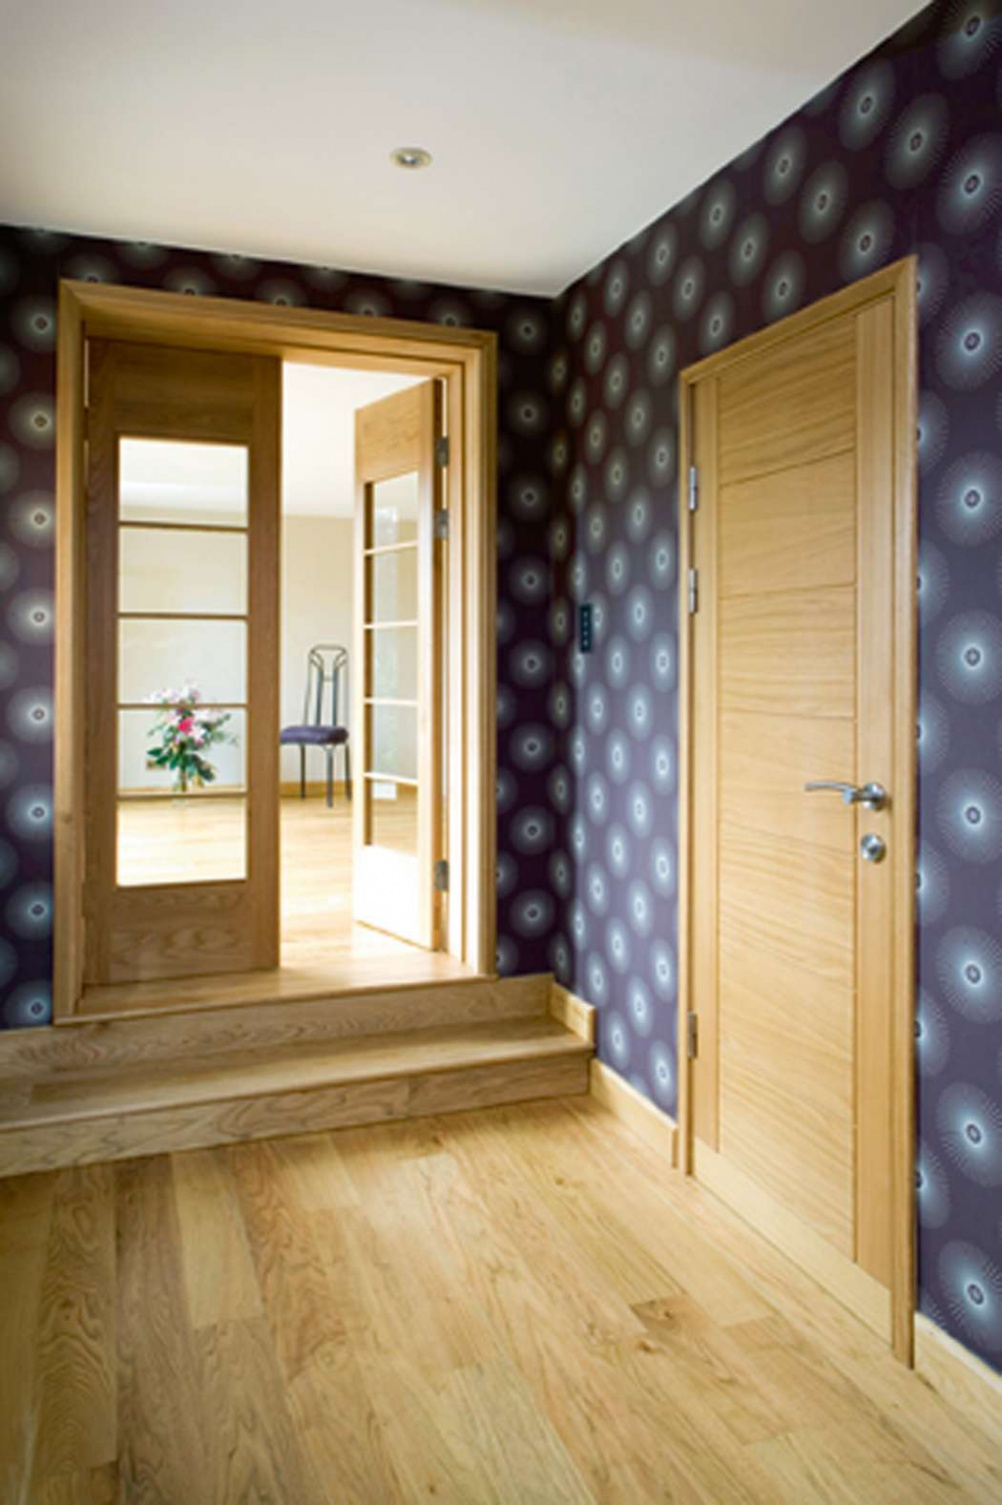 Doors by Scotts of Thrapston